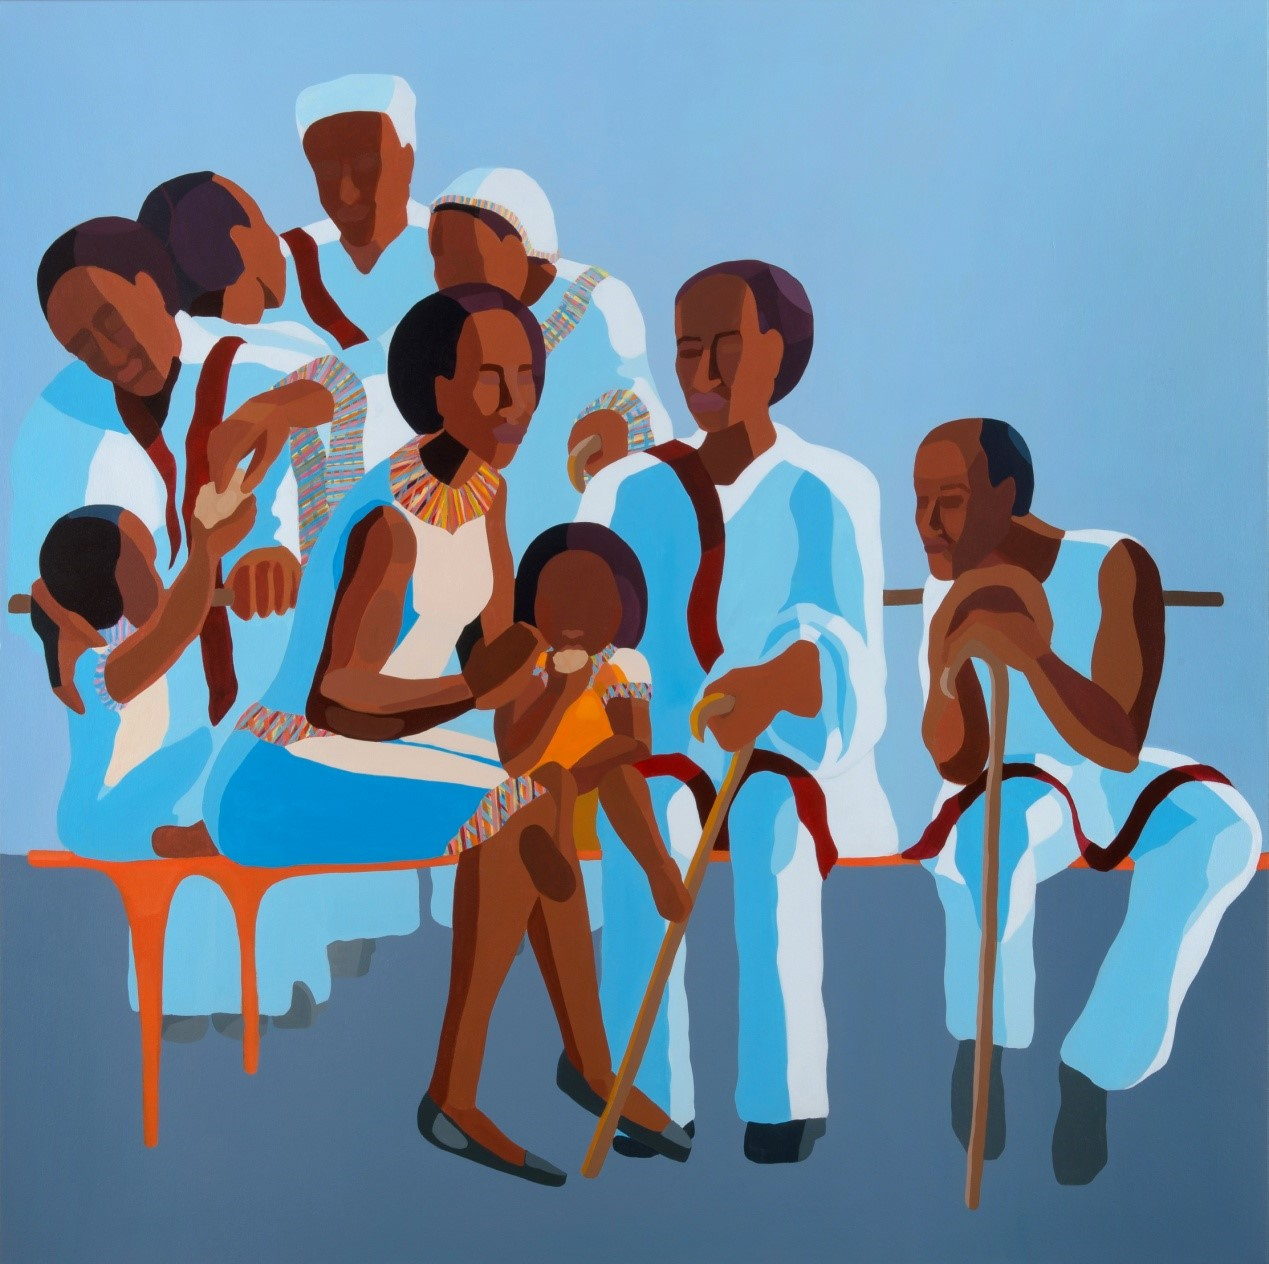 Nirit Takele, Saturday after prayer, 150x150 cm, acrylic on canvas, 2017